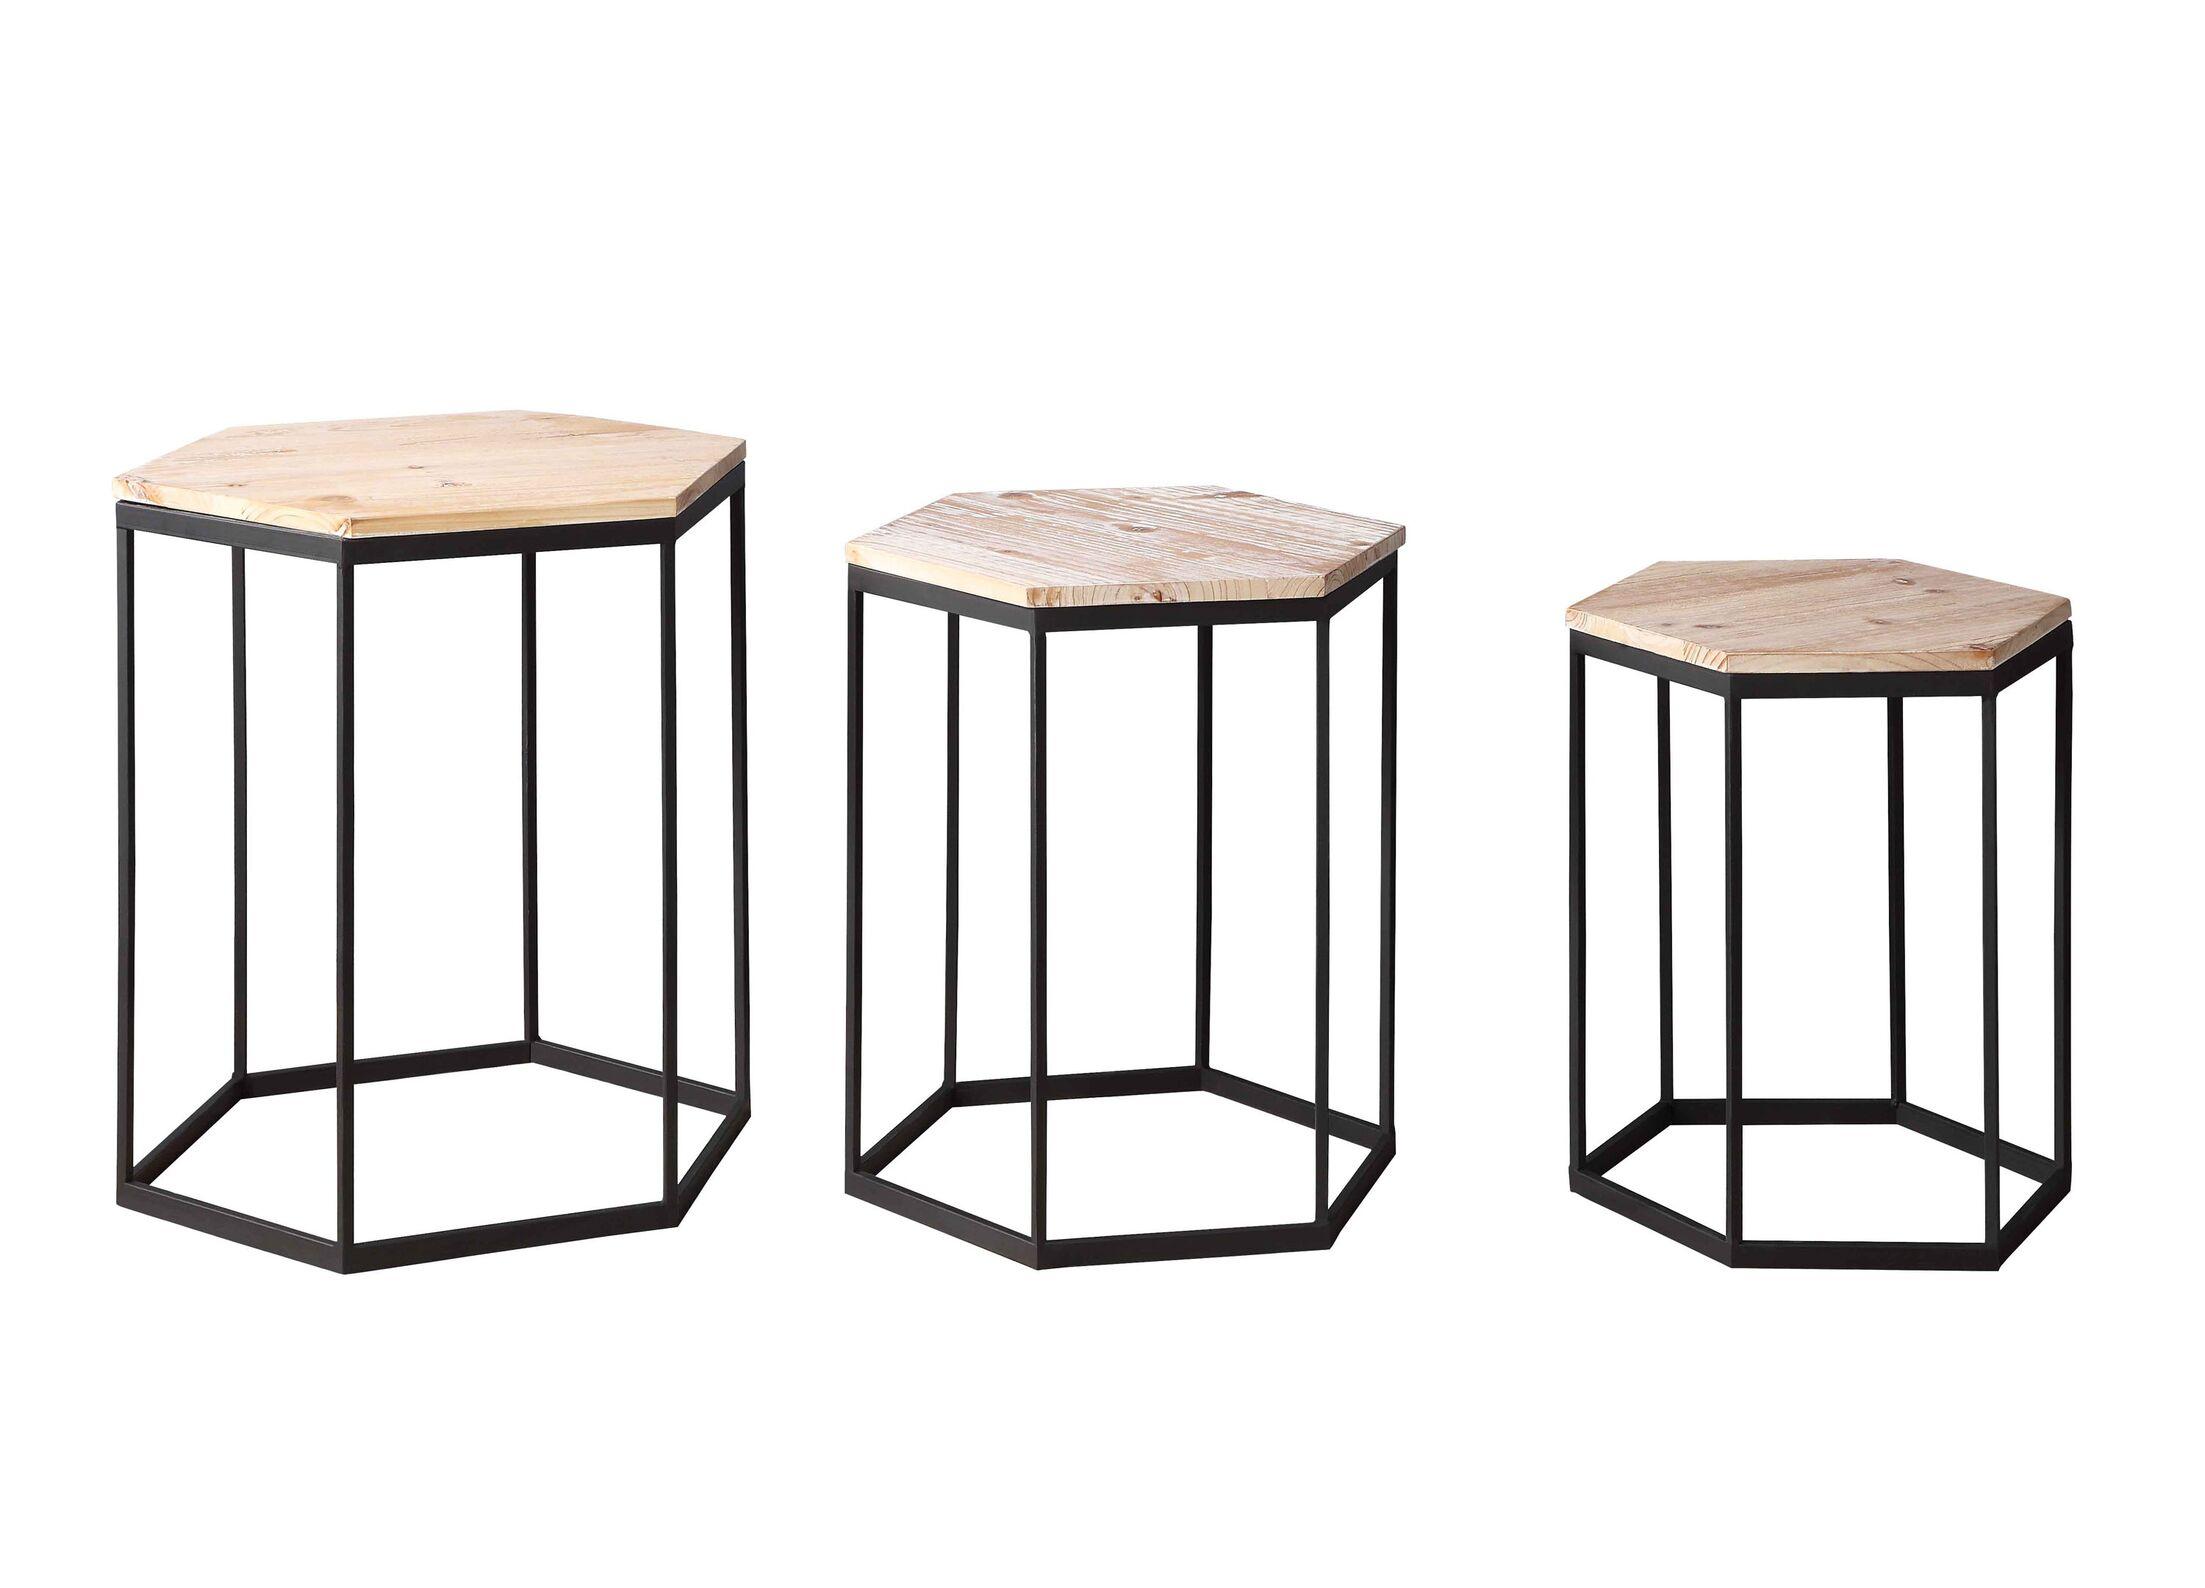 Stromberg 3 Piece Nesting Tables